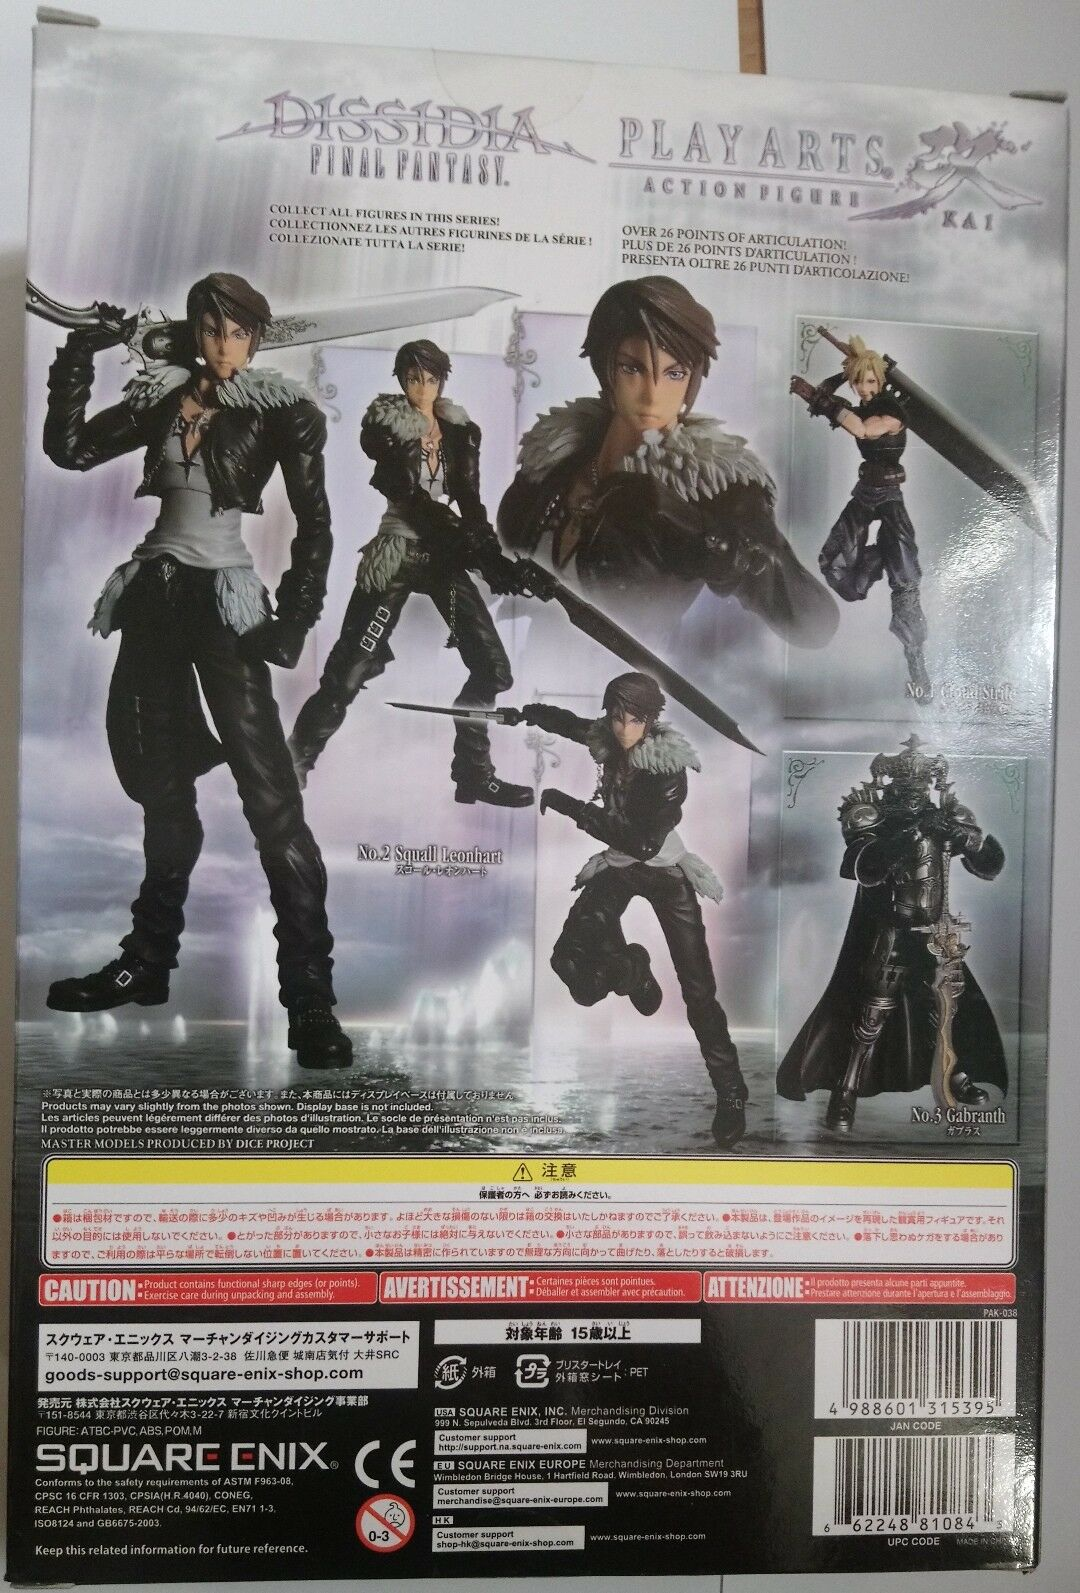 Play Arts Kai [Squall Leonhart] Dissidia Final Final Final Fantasy Action Figure NEW 283900